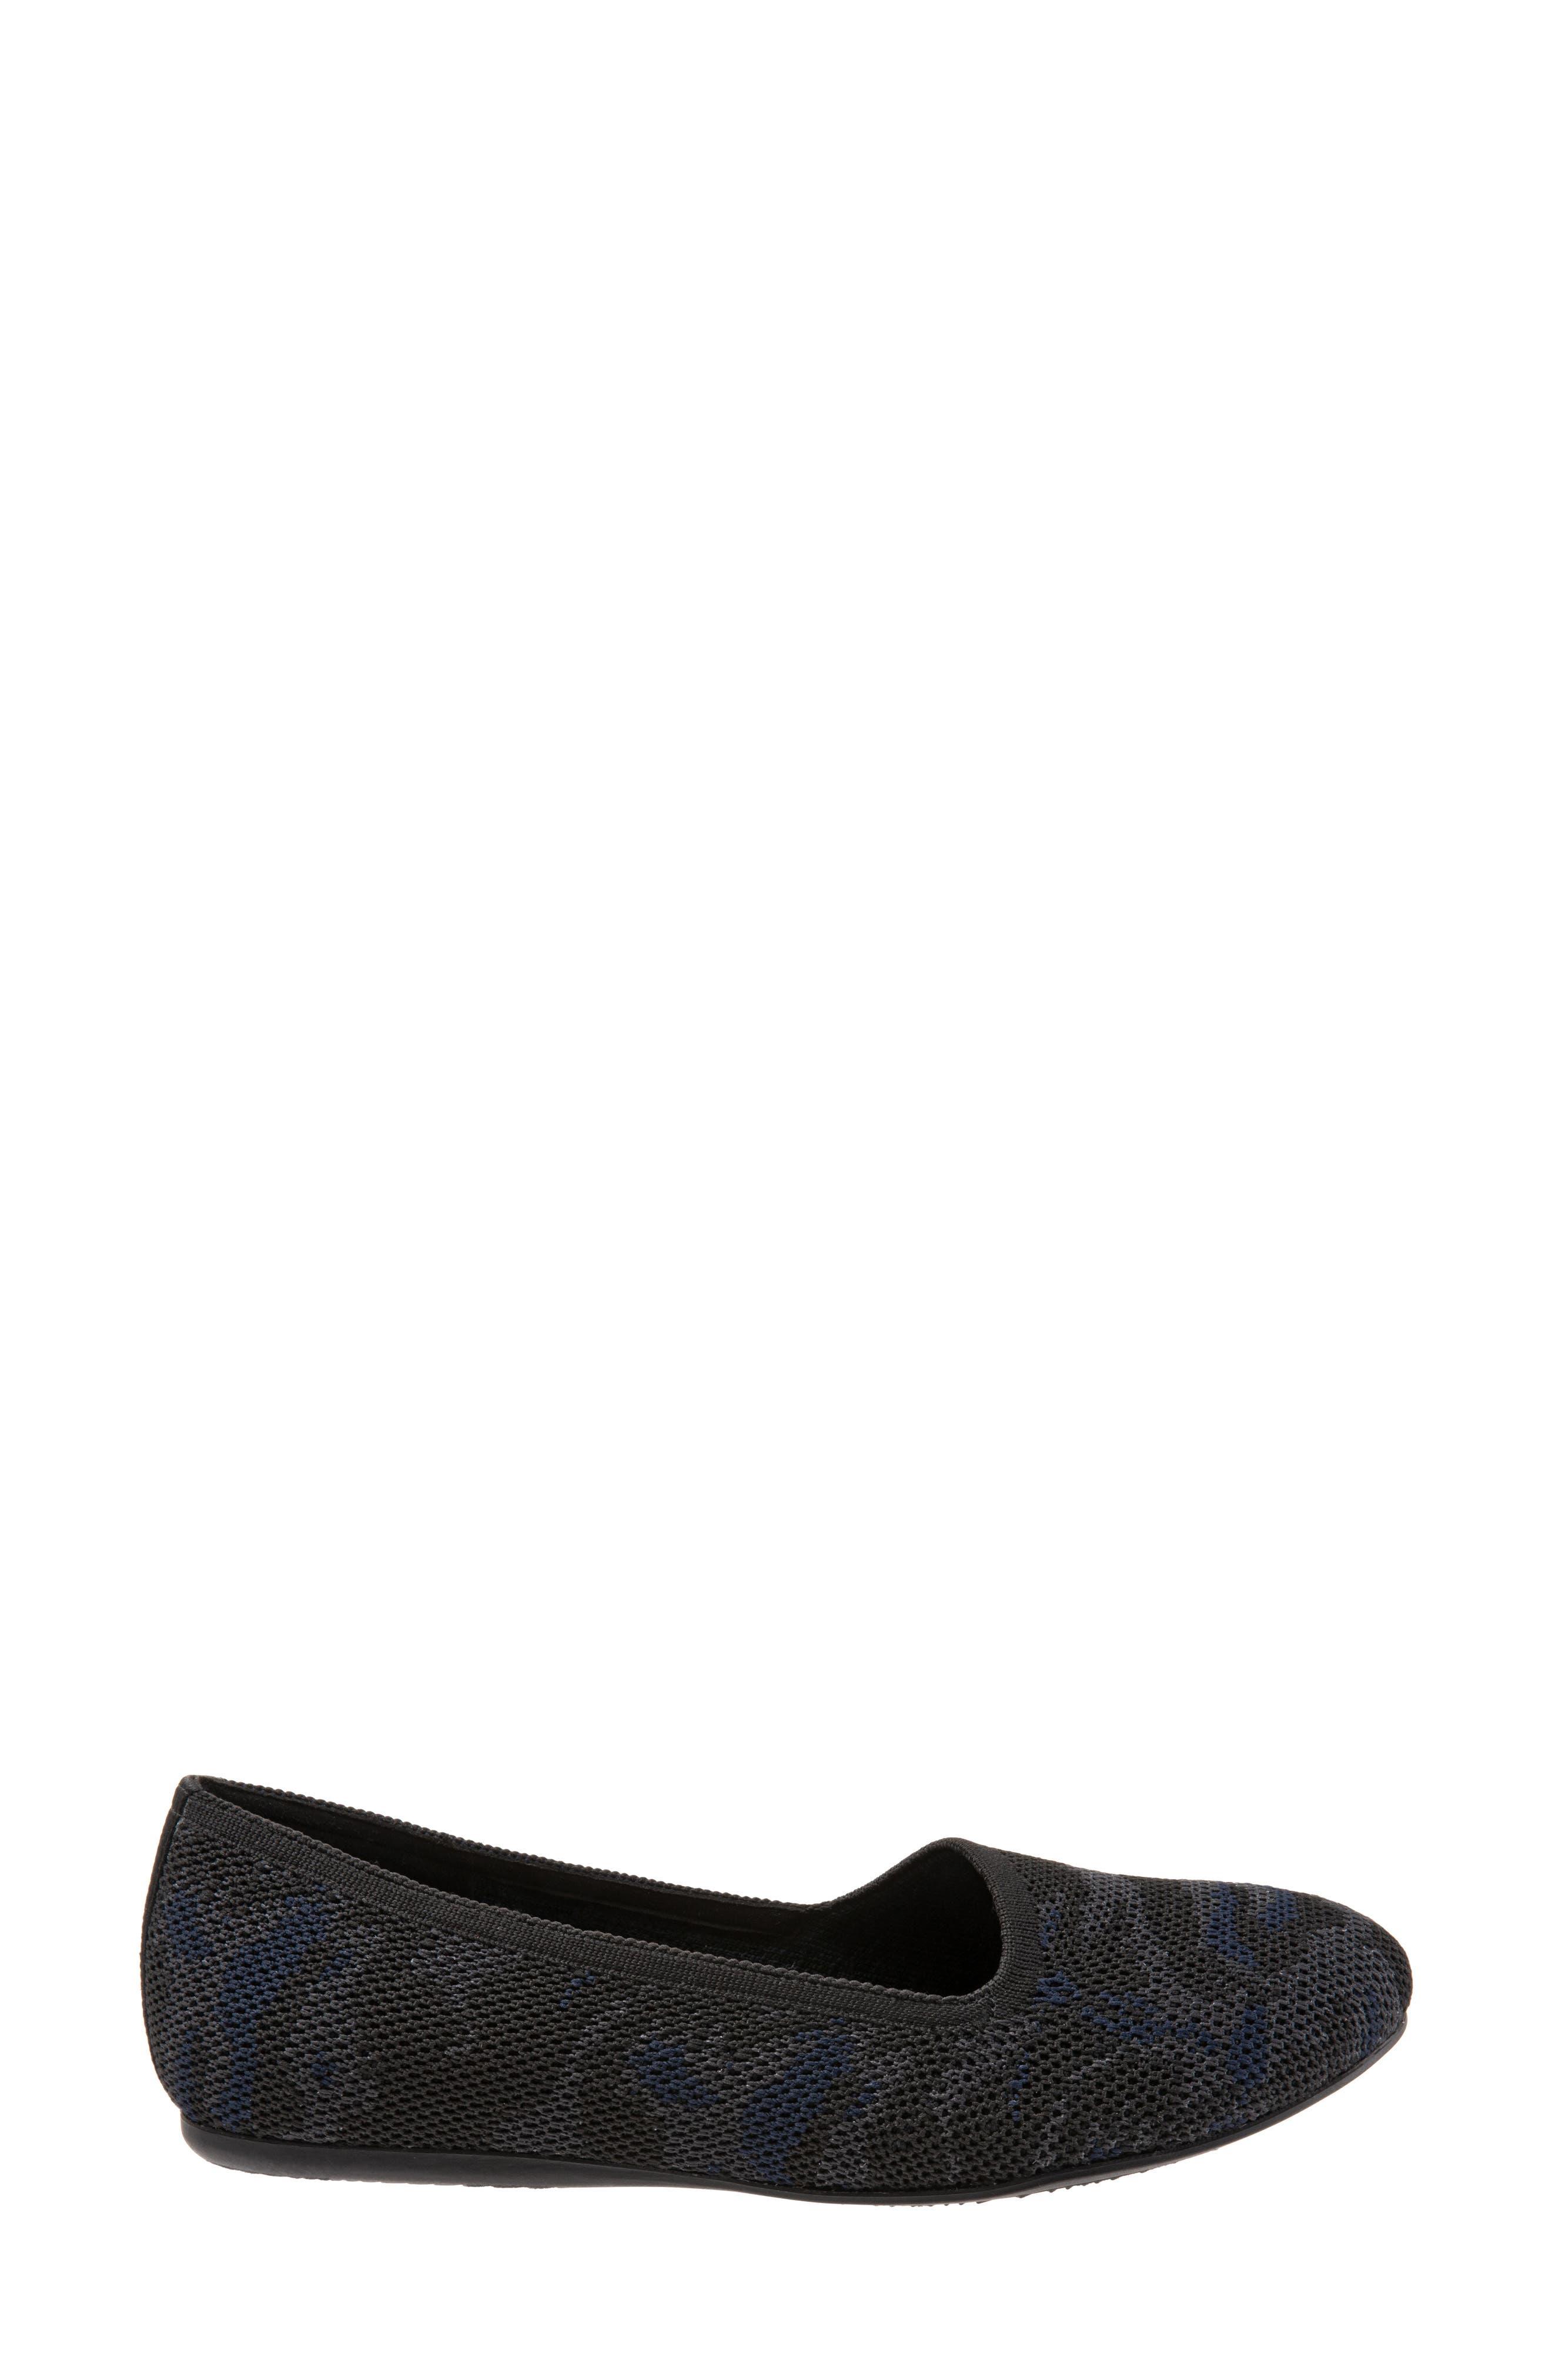 SOFTWALK<SUP>®</SUP>, Sicily Knit Flat, Alternate thumbnail 3, color, BLACK/ GREY FABRIC